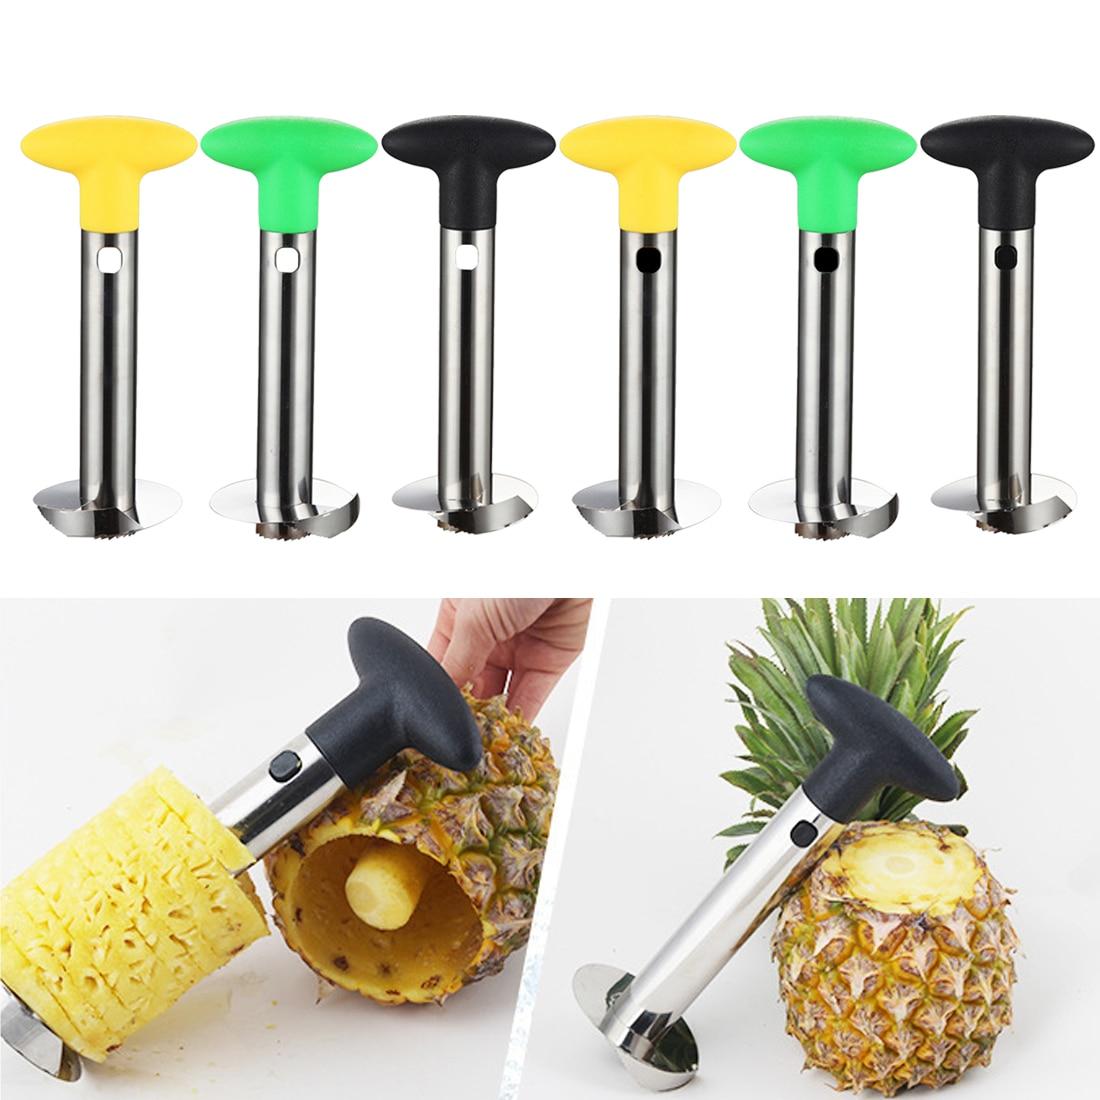 Stainless Steel Pineapple Peeler Cutter Slicer Corer Peel Core Tools Fruit Vegetable Knife  Kitchen Gadget High Quality